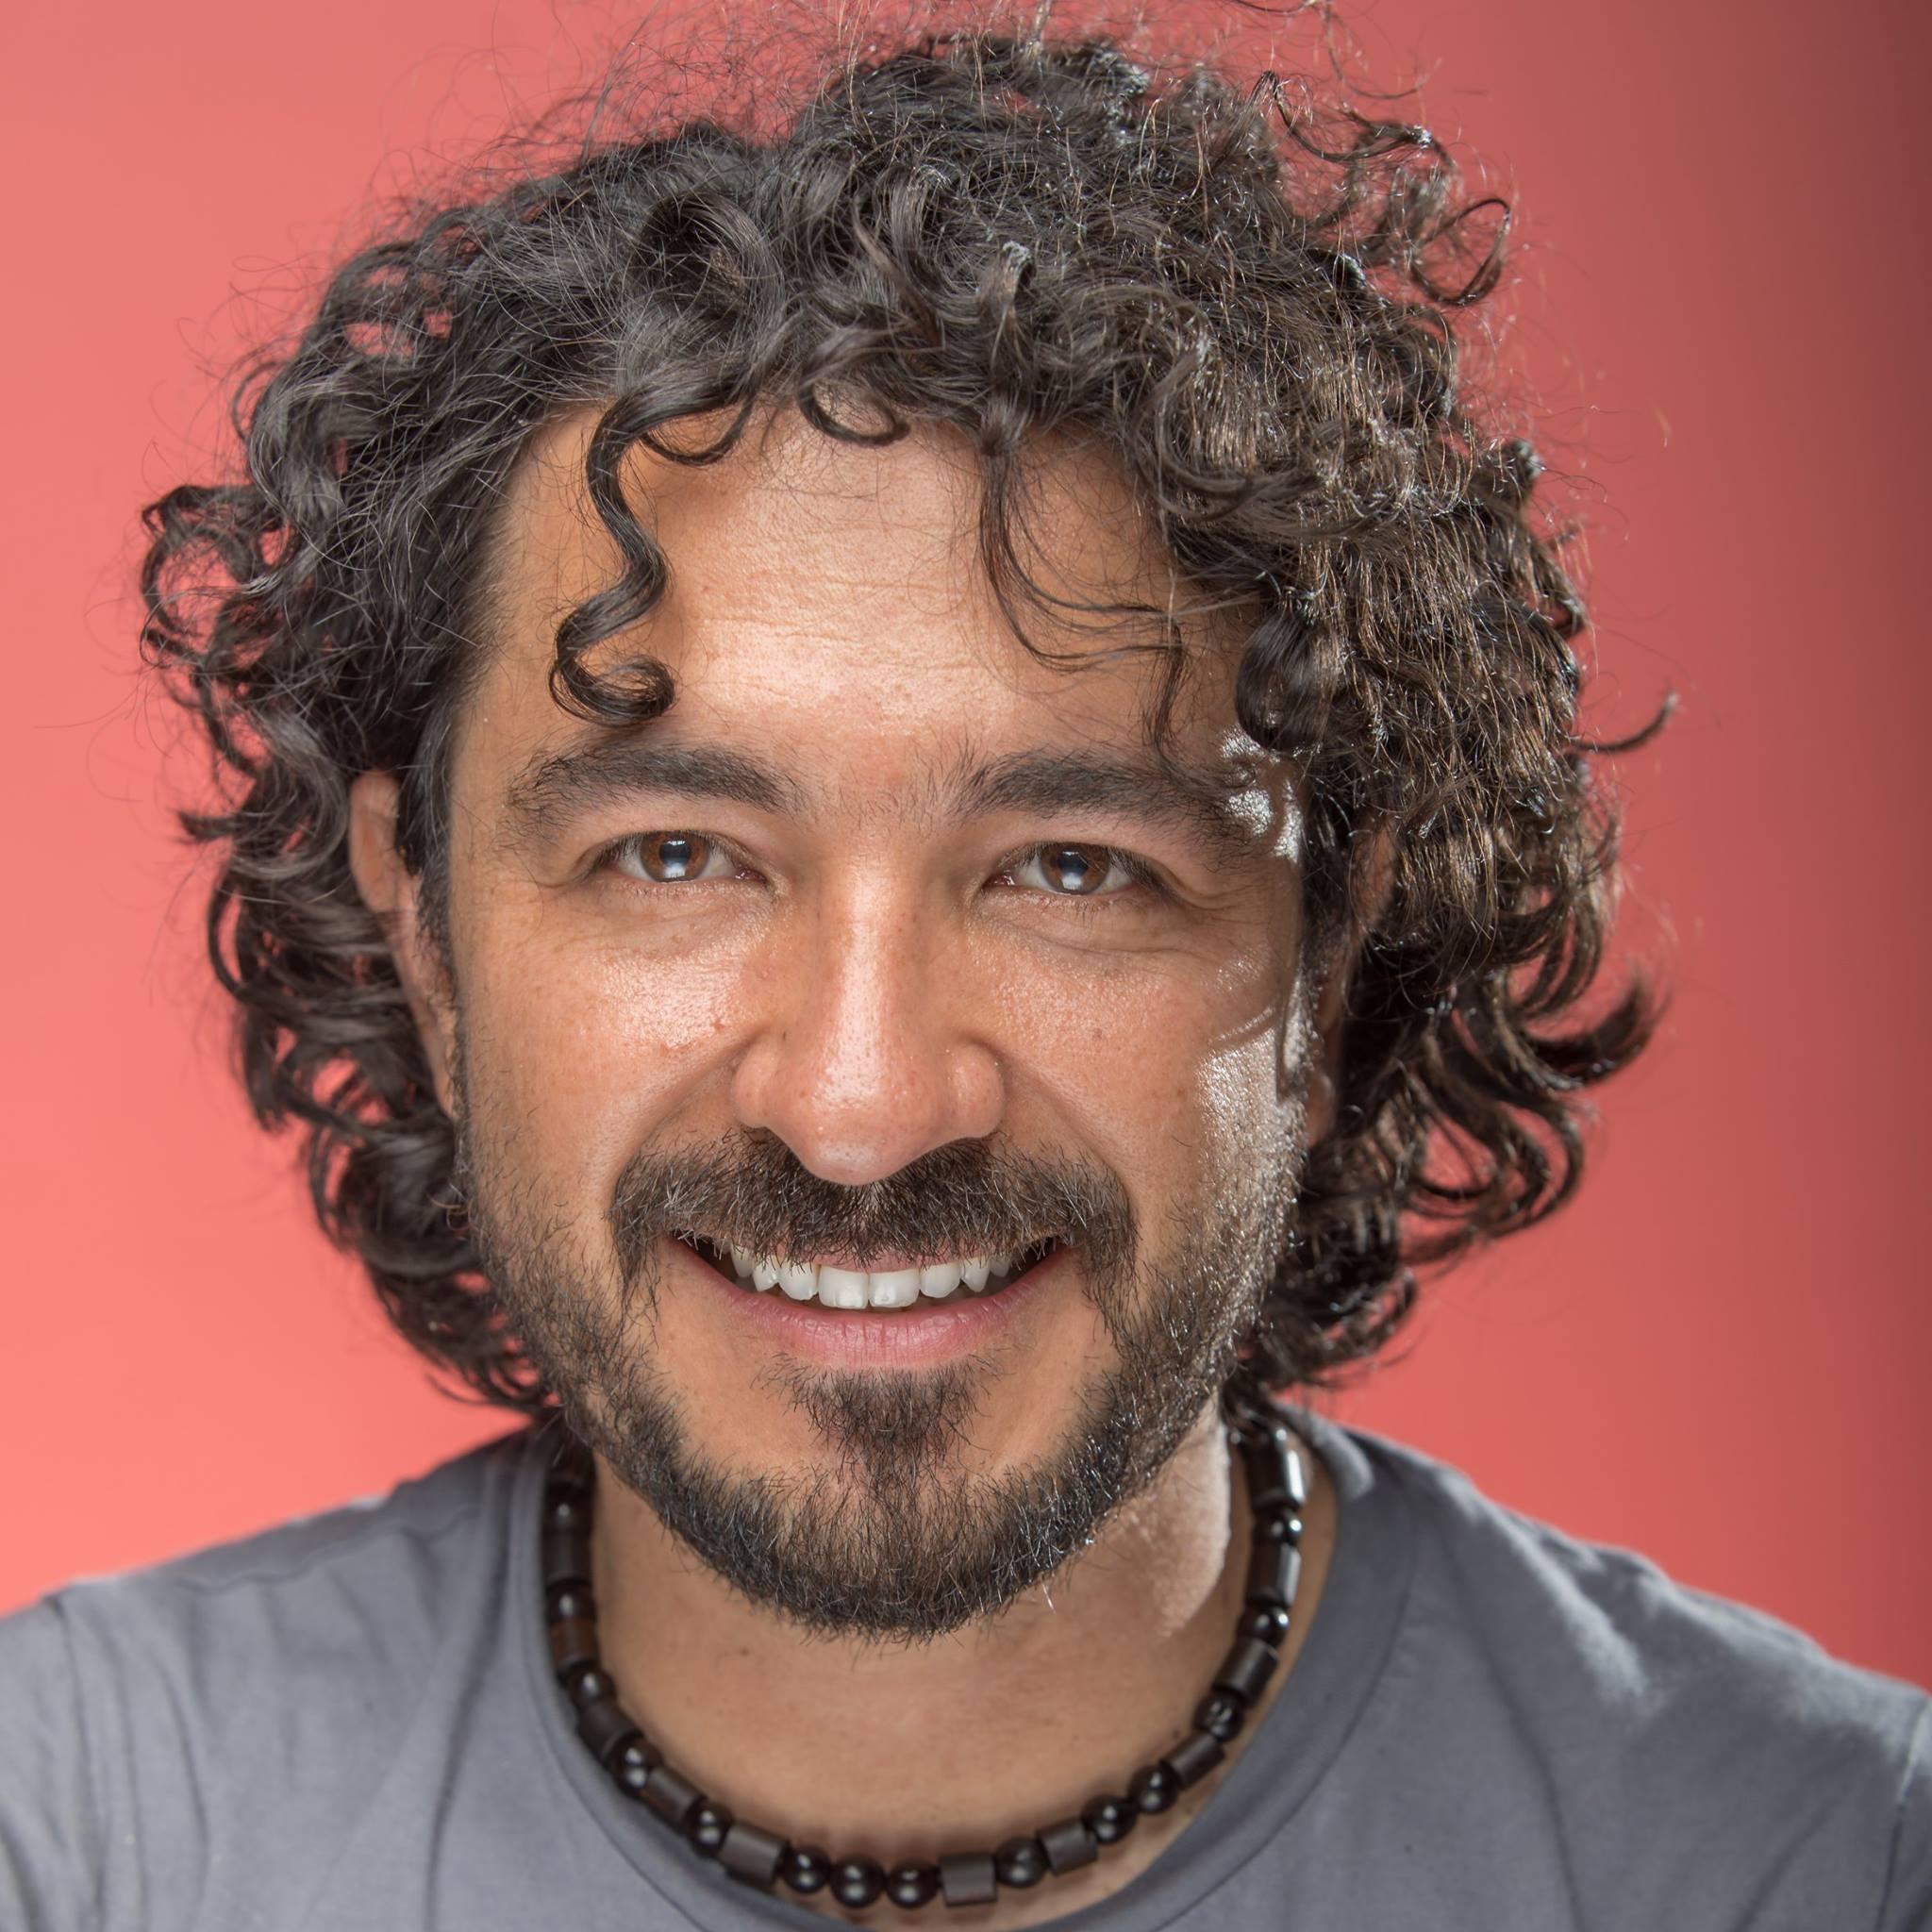 Mario Carvajal, Fotógrafo